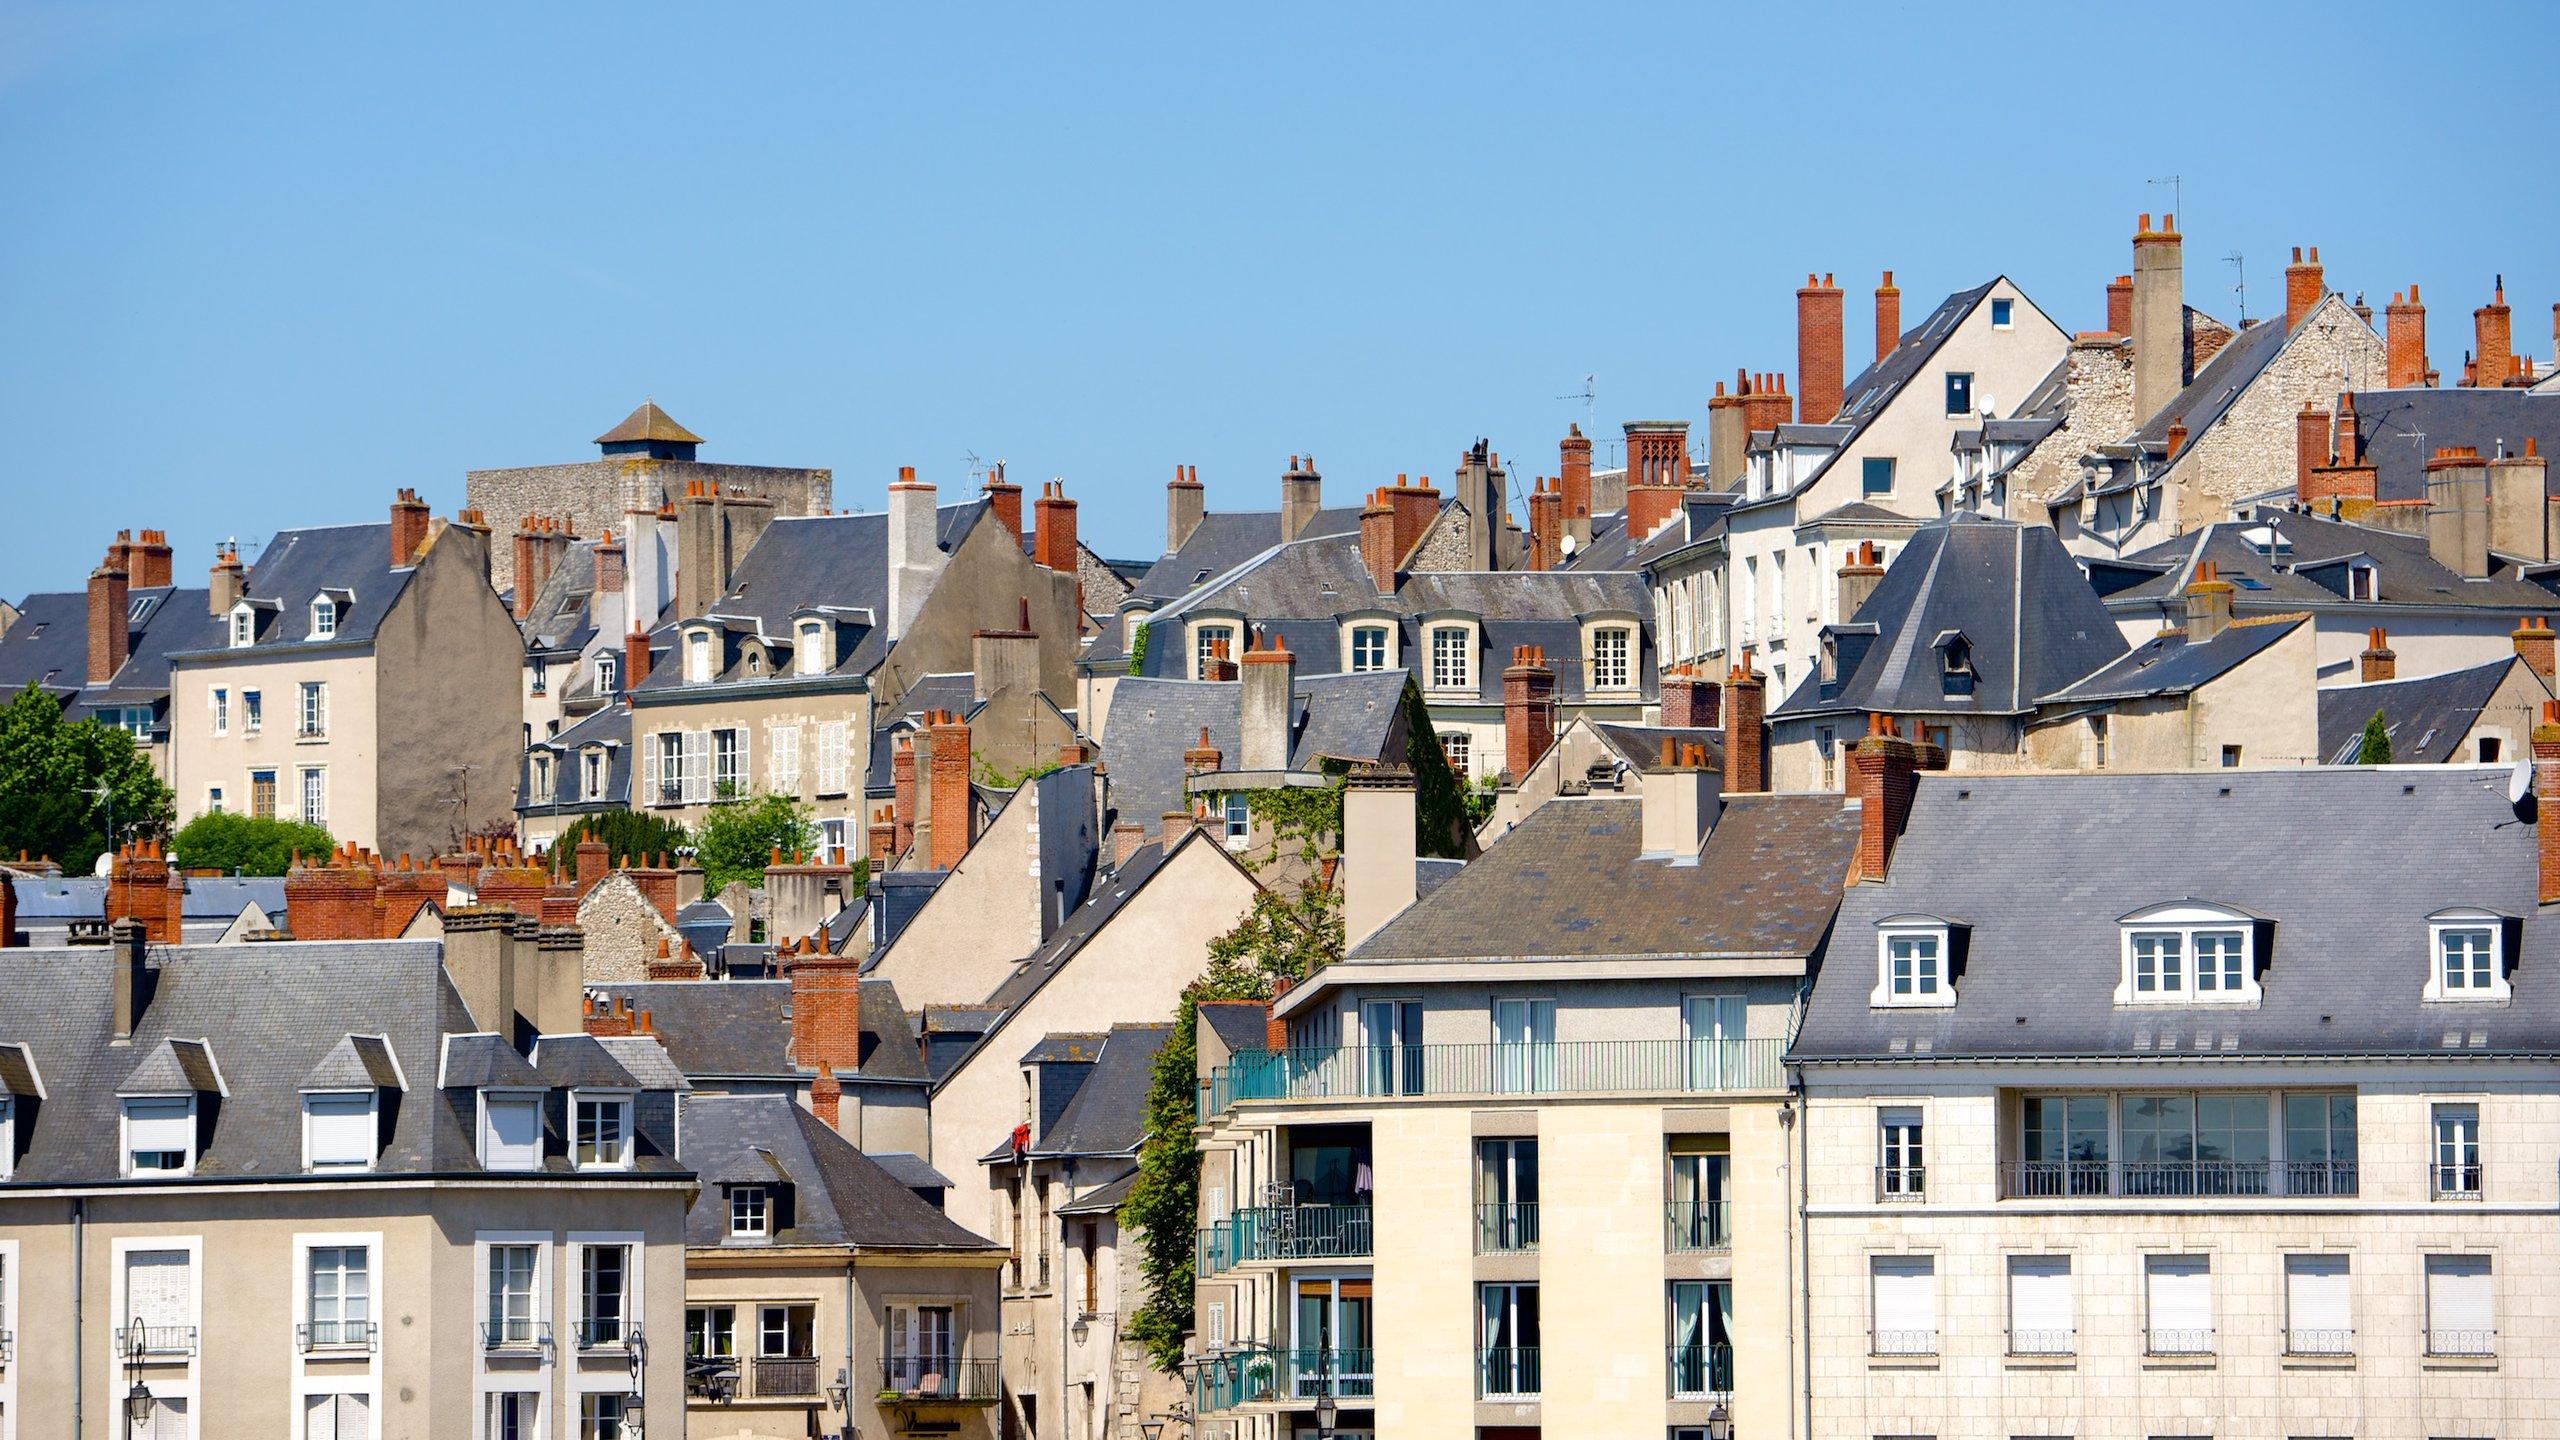 Blois, Loir-et-Cher, France